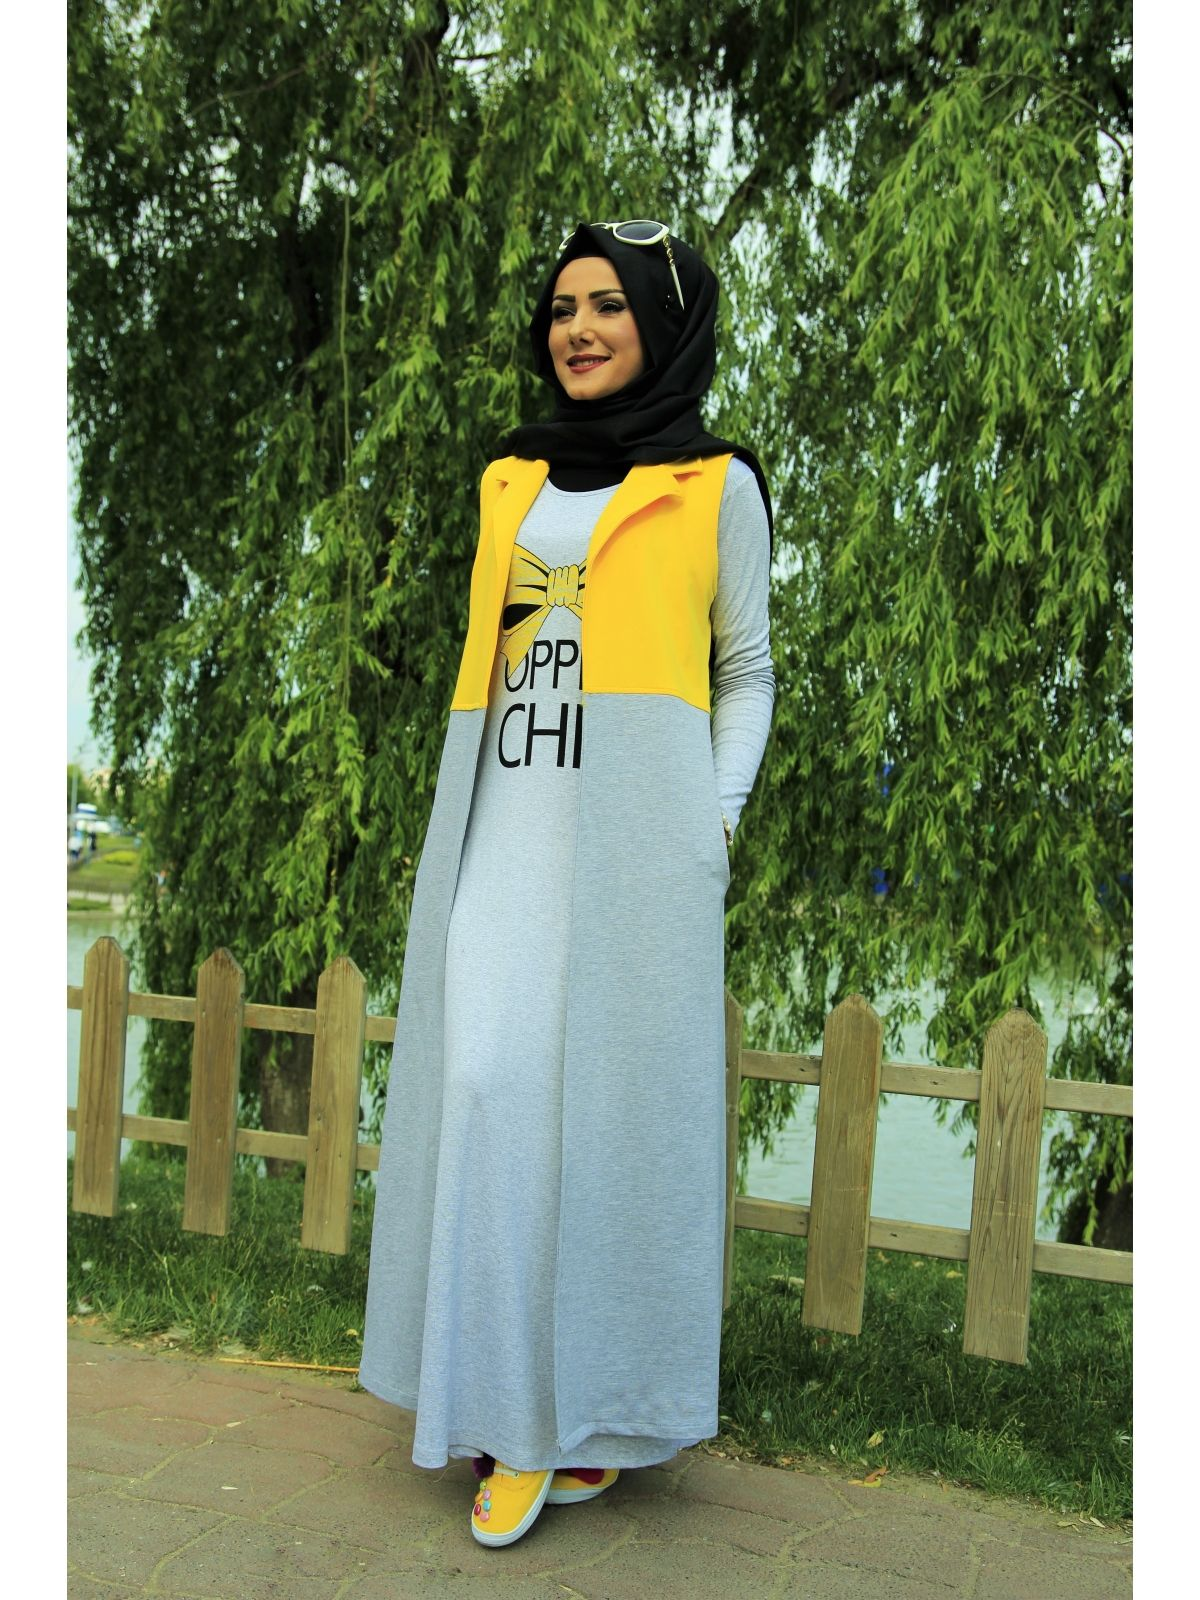 5 Parca Super Yaz Kombini Sari Islami Moda Musluman Modasi Spor Giyim